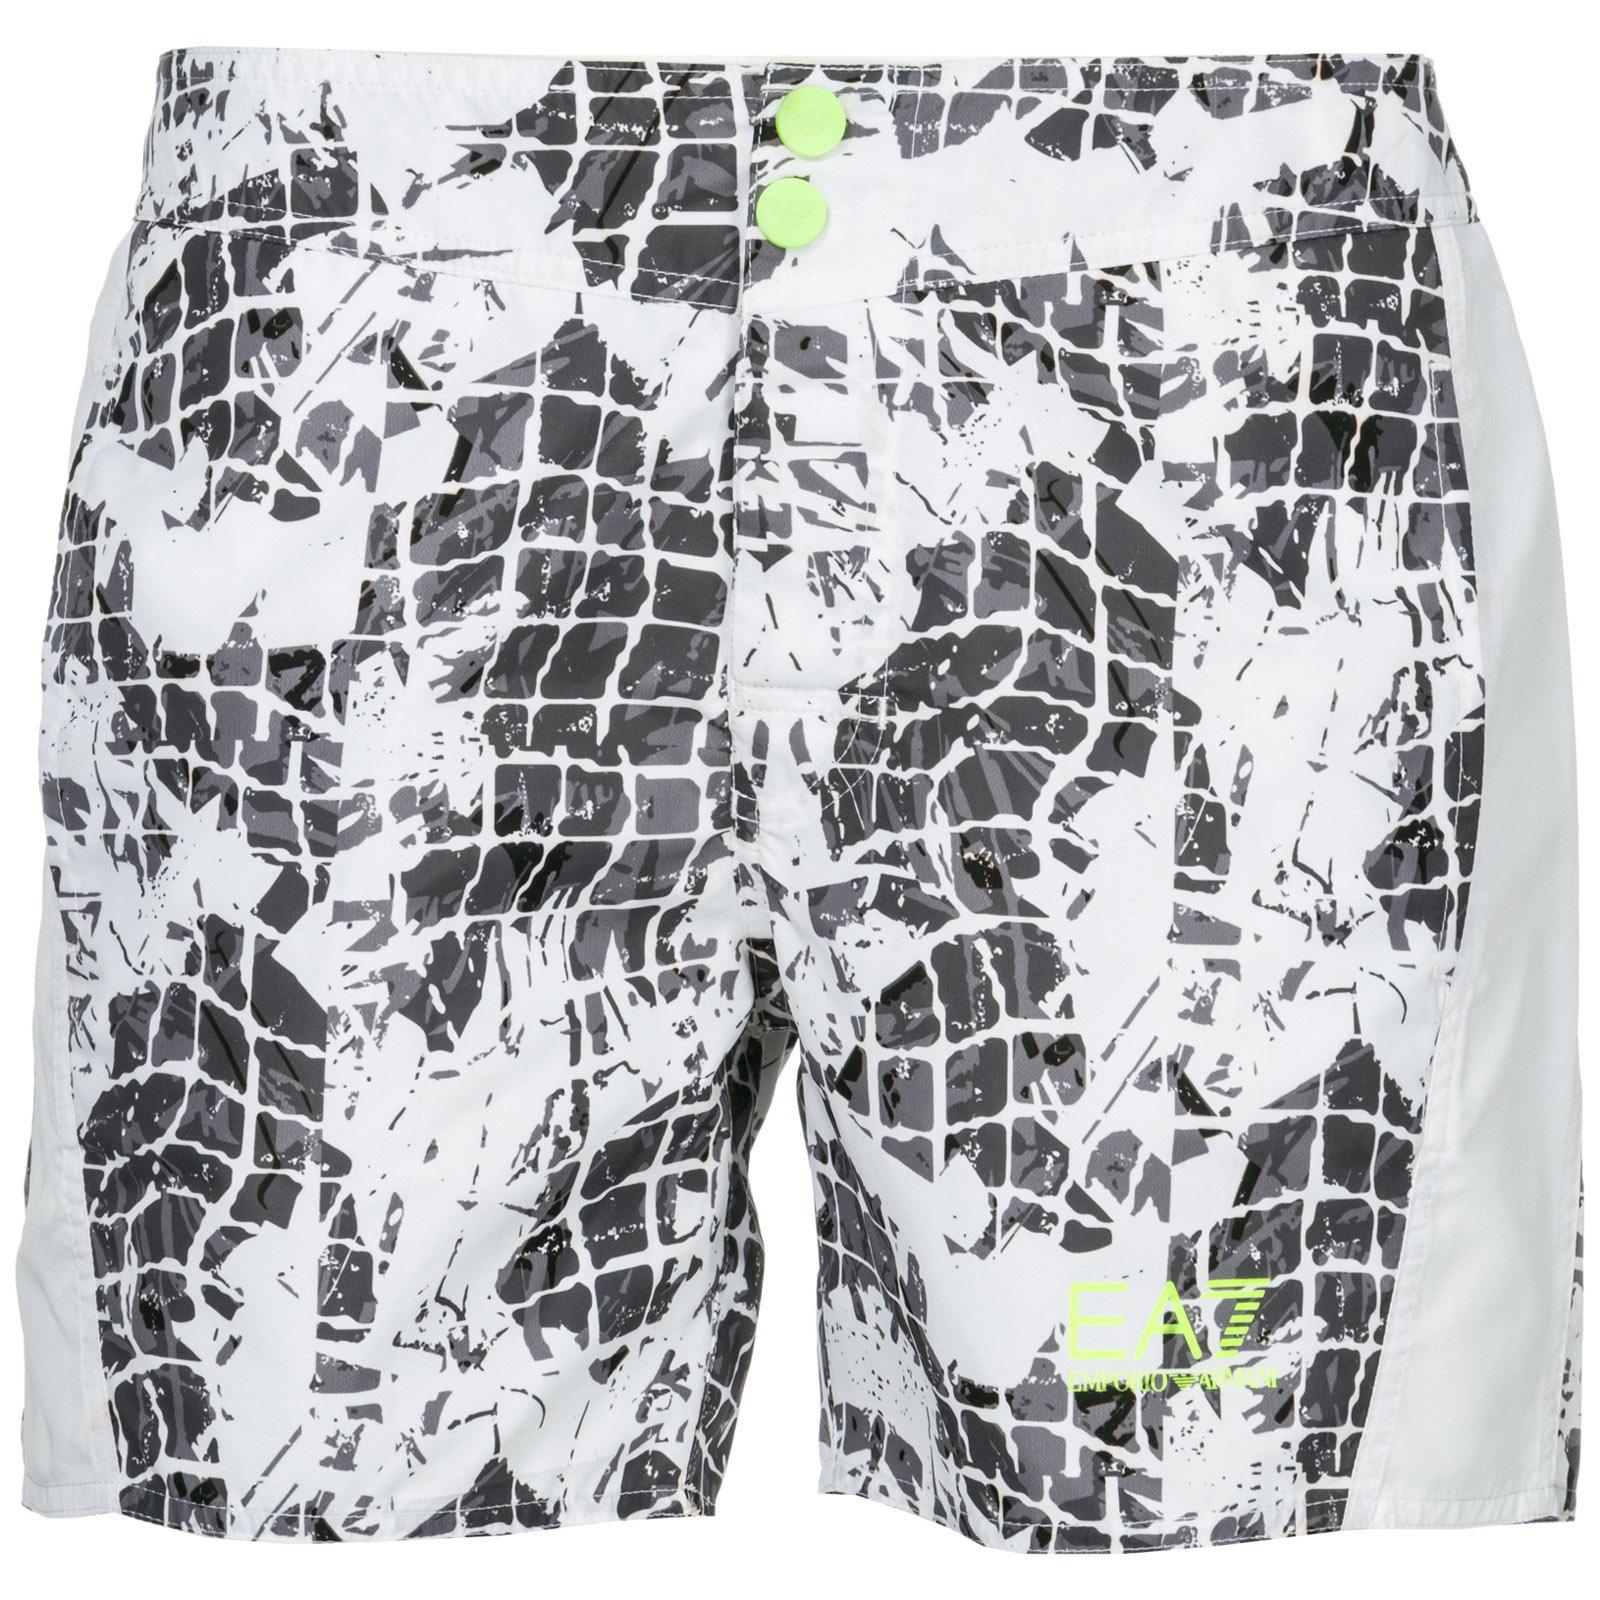 532828919b370 Emporio Armani EA7 Men's shorts swimsuit bathing trunks swimming suit  evoplus